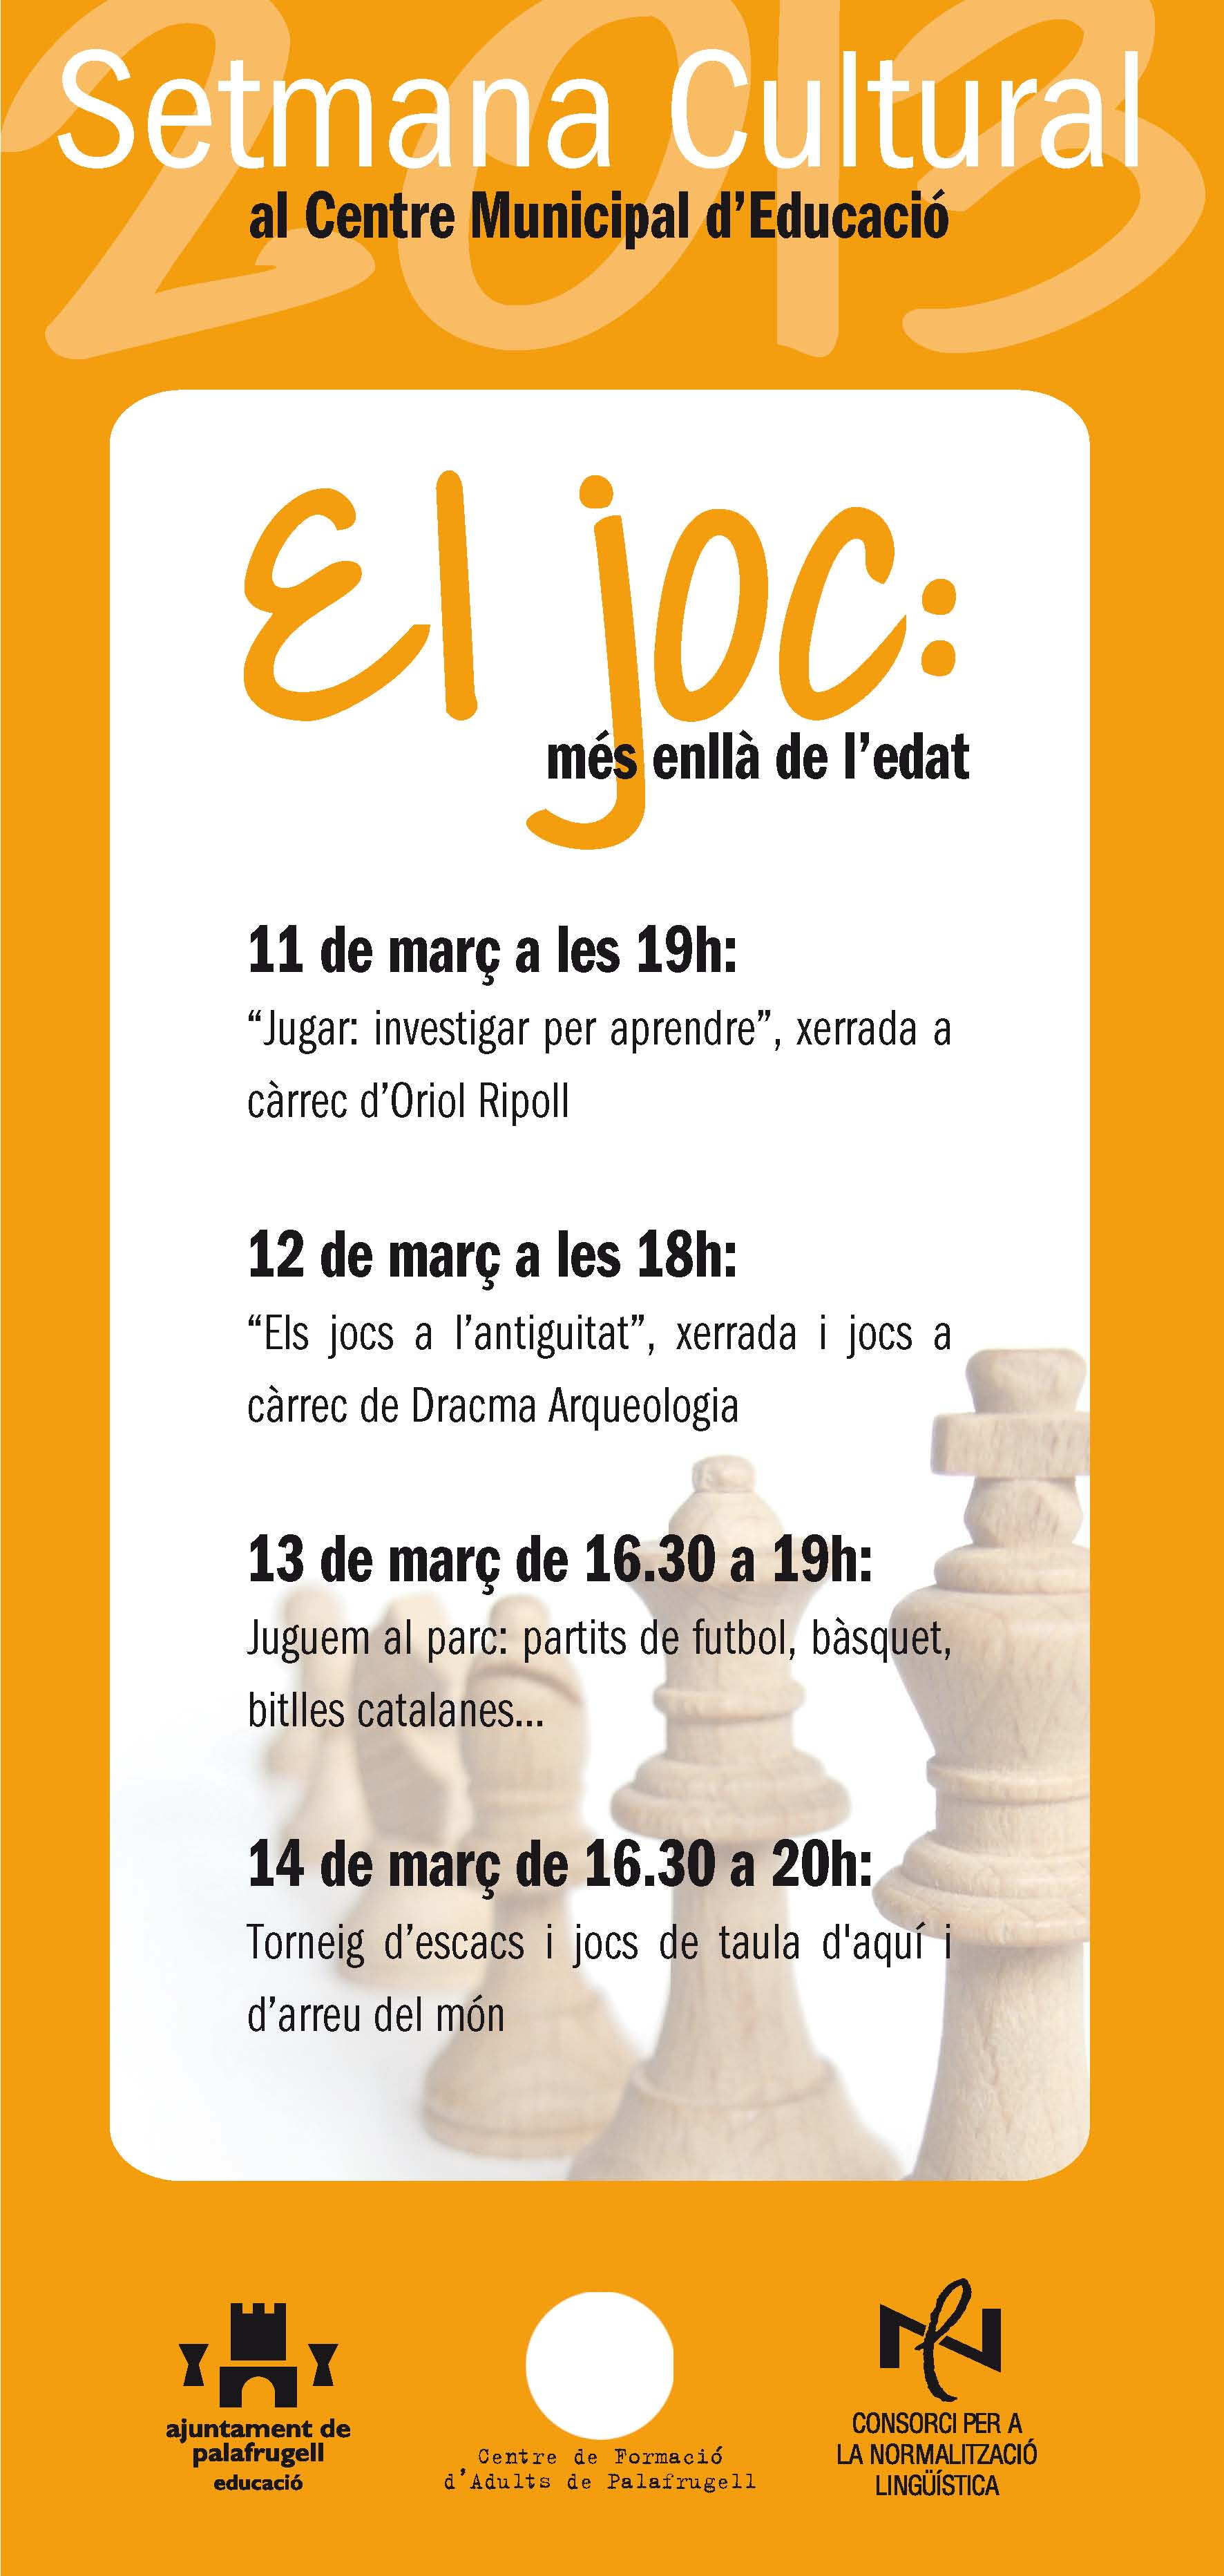 201303 setmana cultural Palafrugell